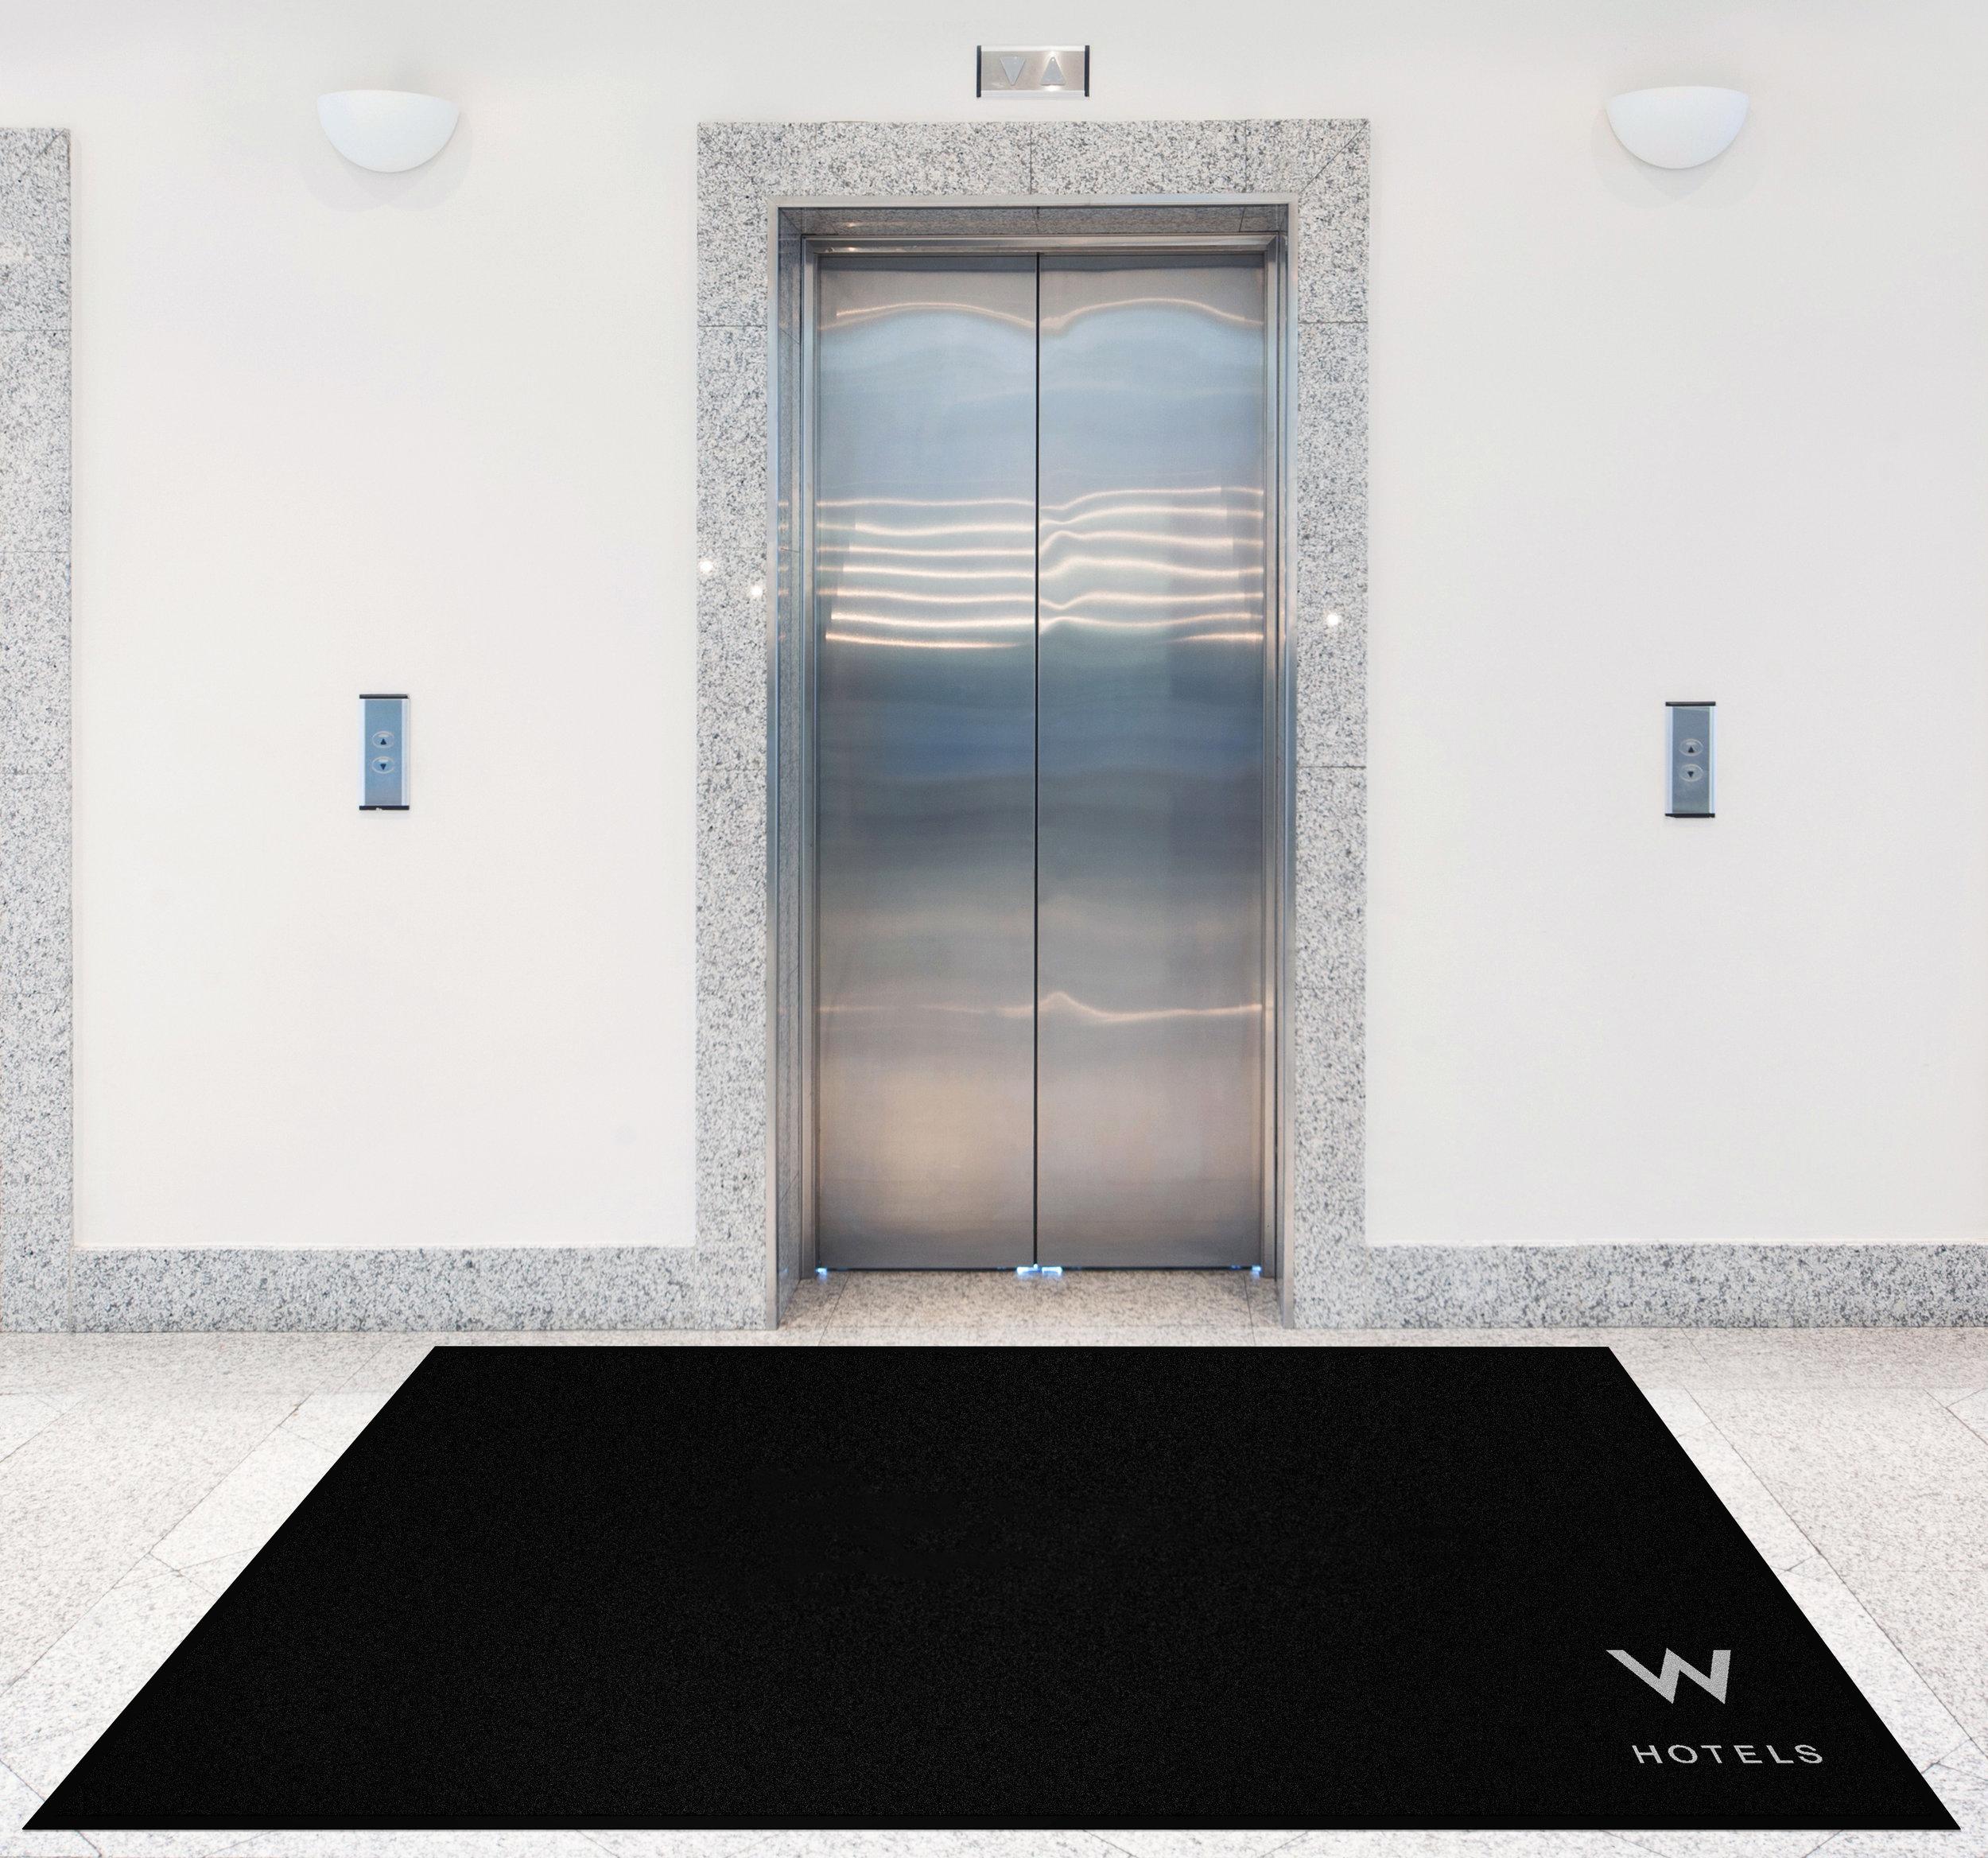 elevator-fjernet-tekst-på-matten.jpg